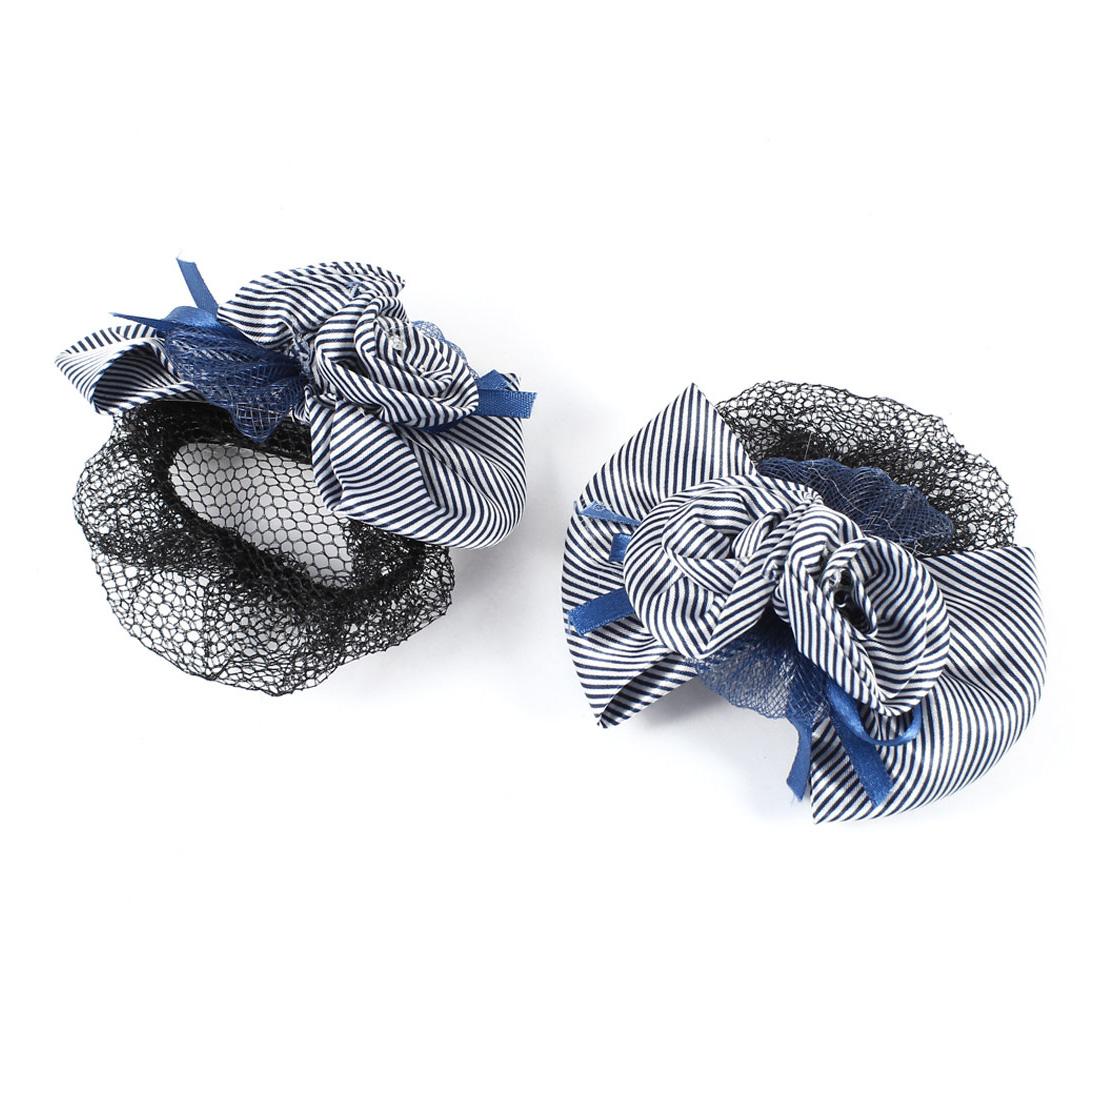 Flower Embellished Bowknot Stripe Print Hair Clip w Snood Net 2pcs